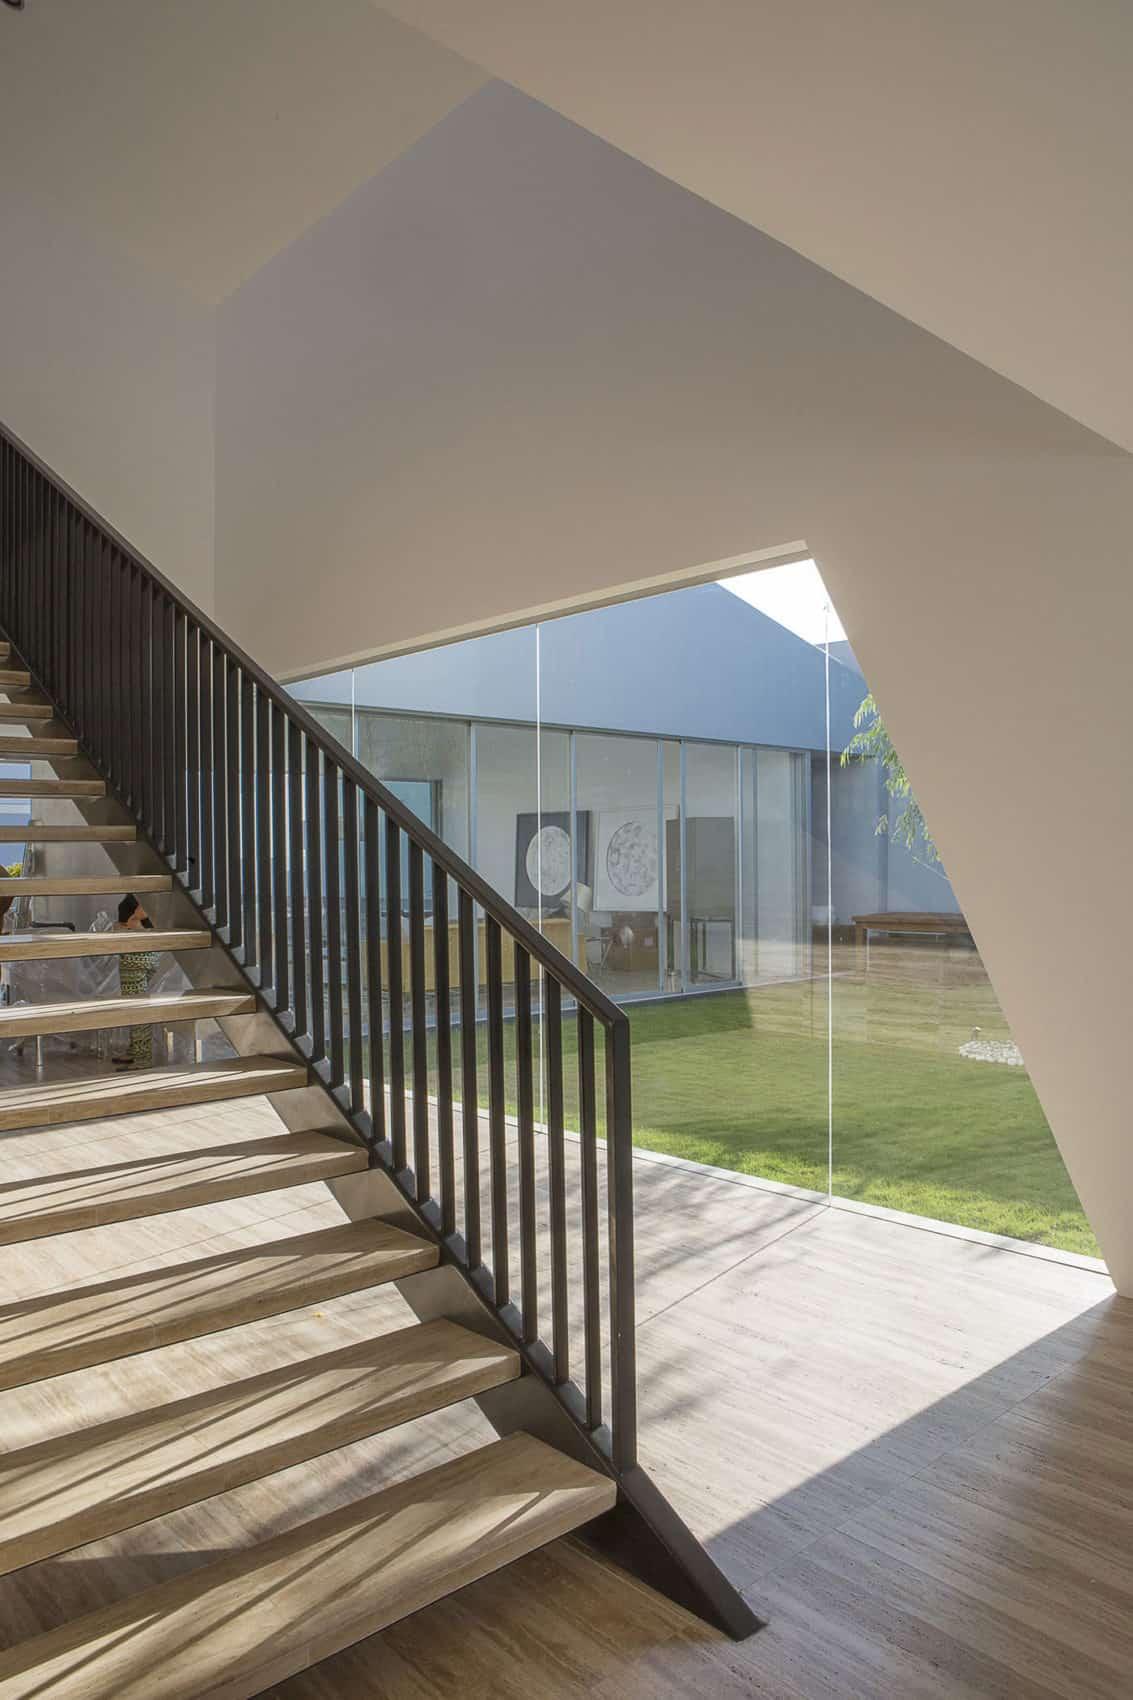 Casa Patios by Riofrio+Rodrigo Arquitectos (8)